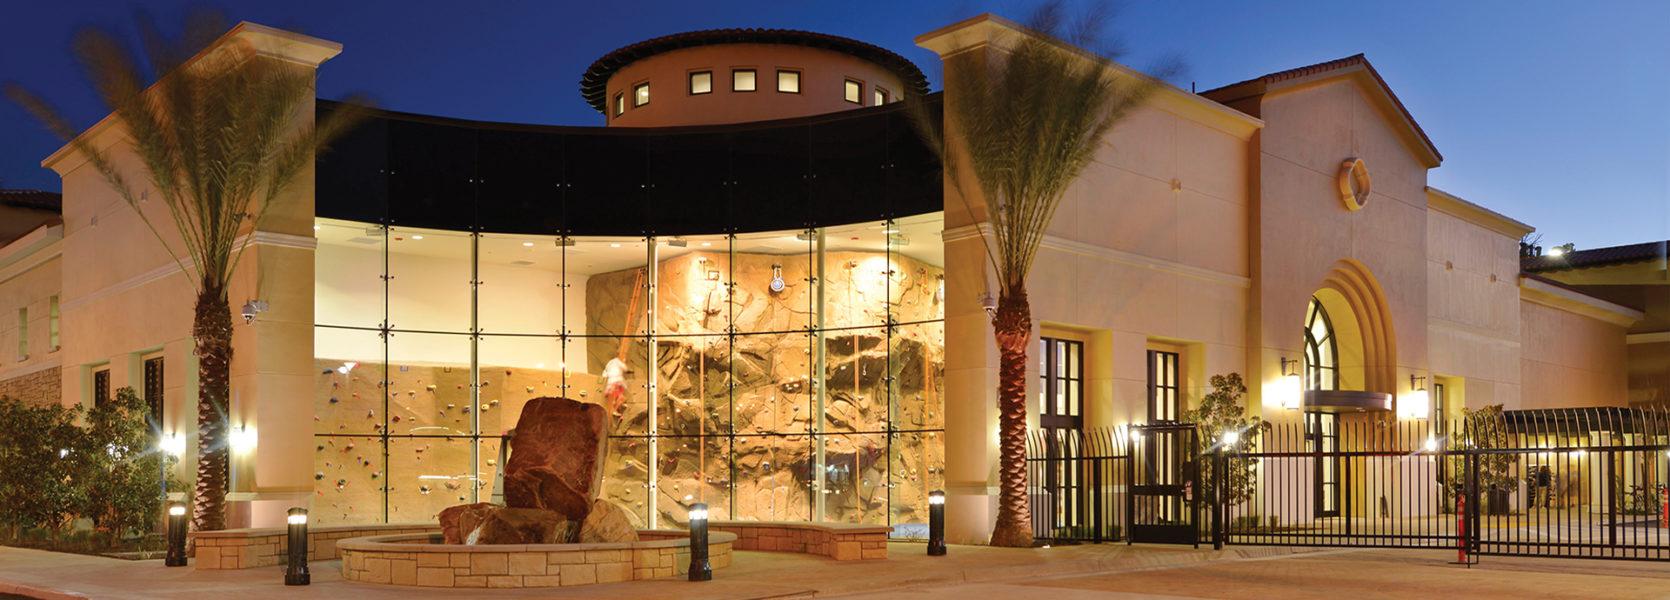 California Baptist University Recreation and Training Center